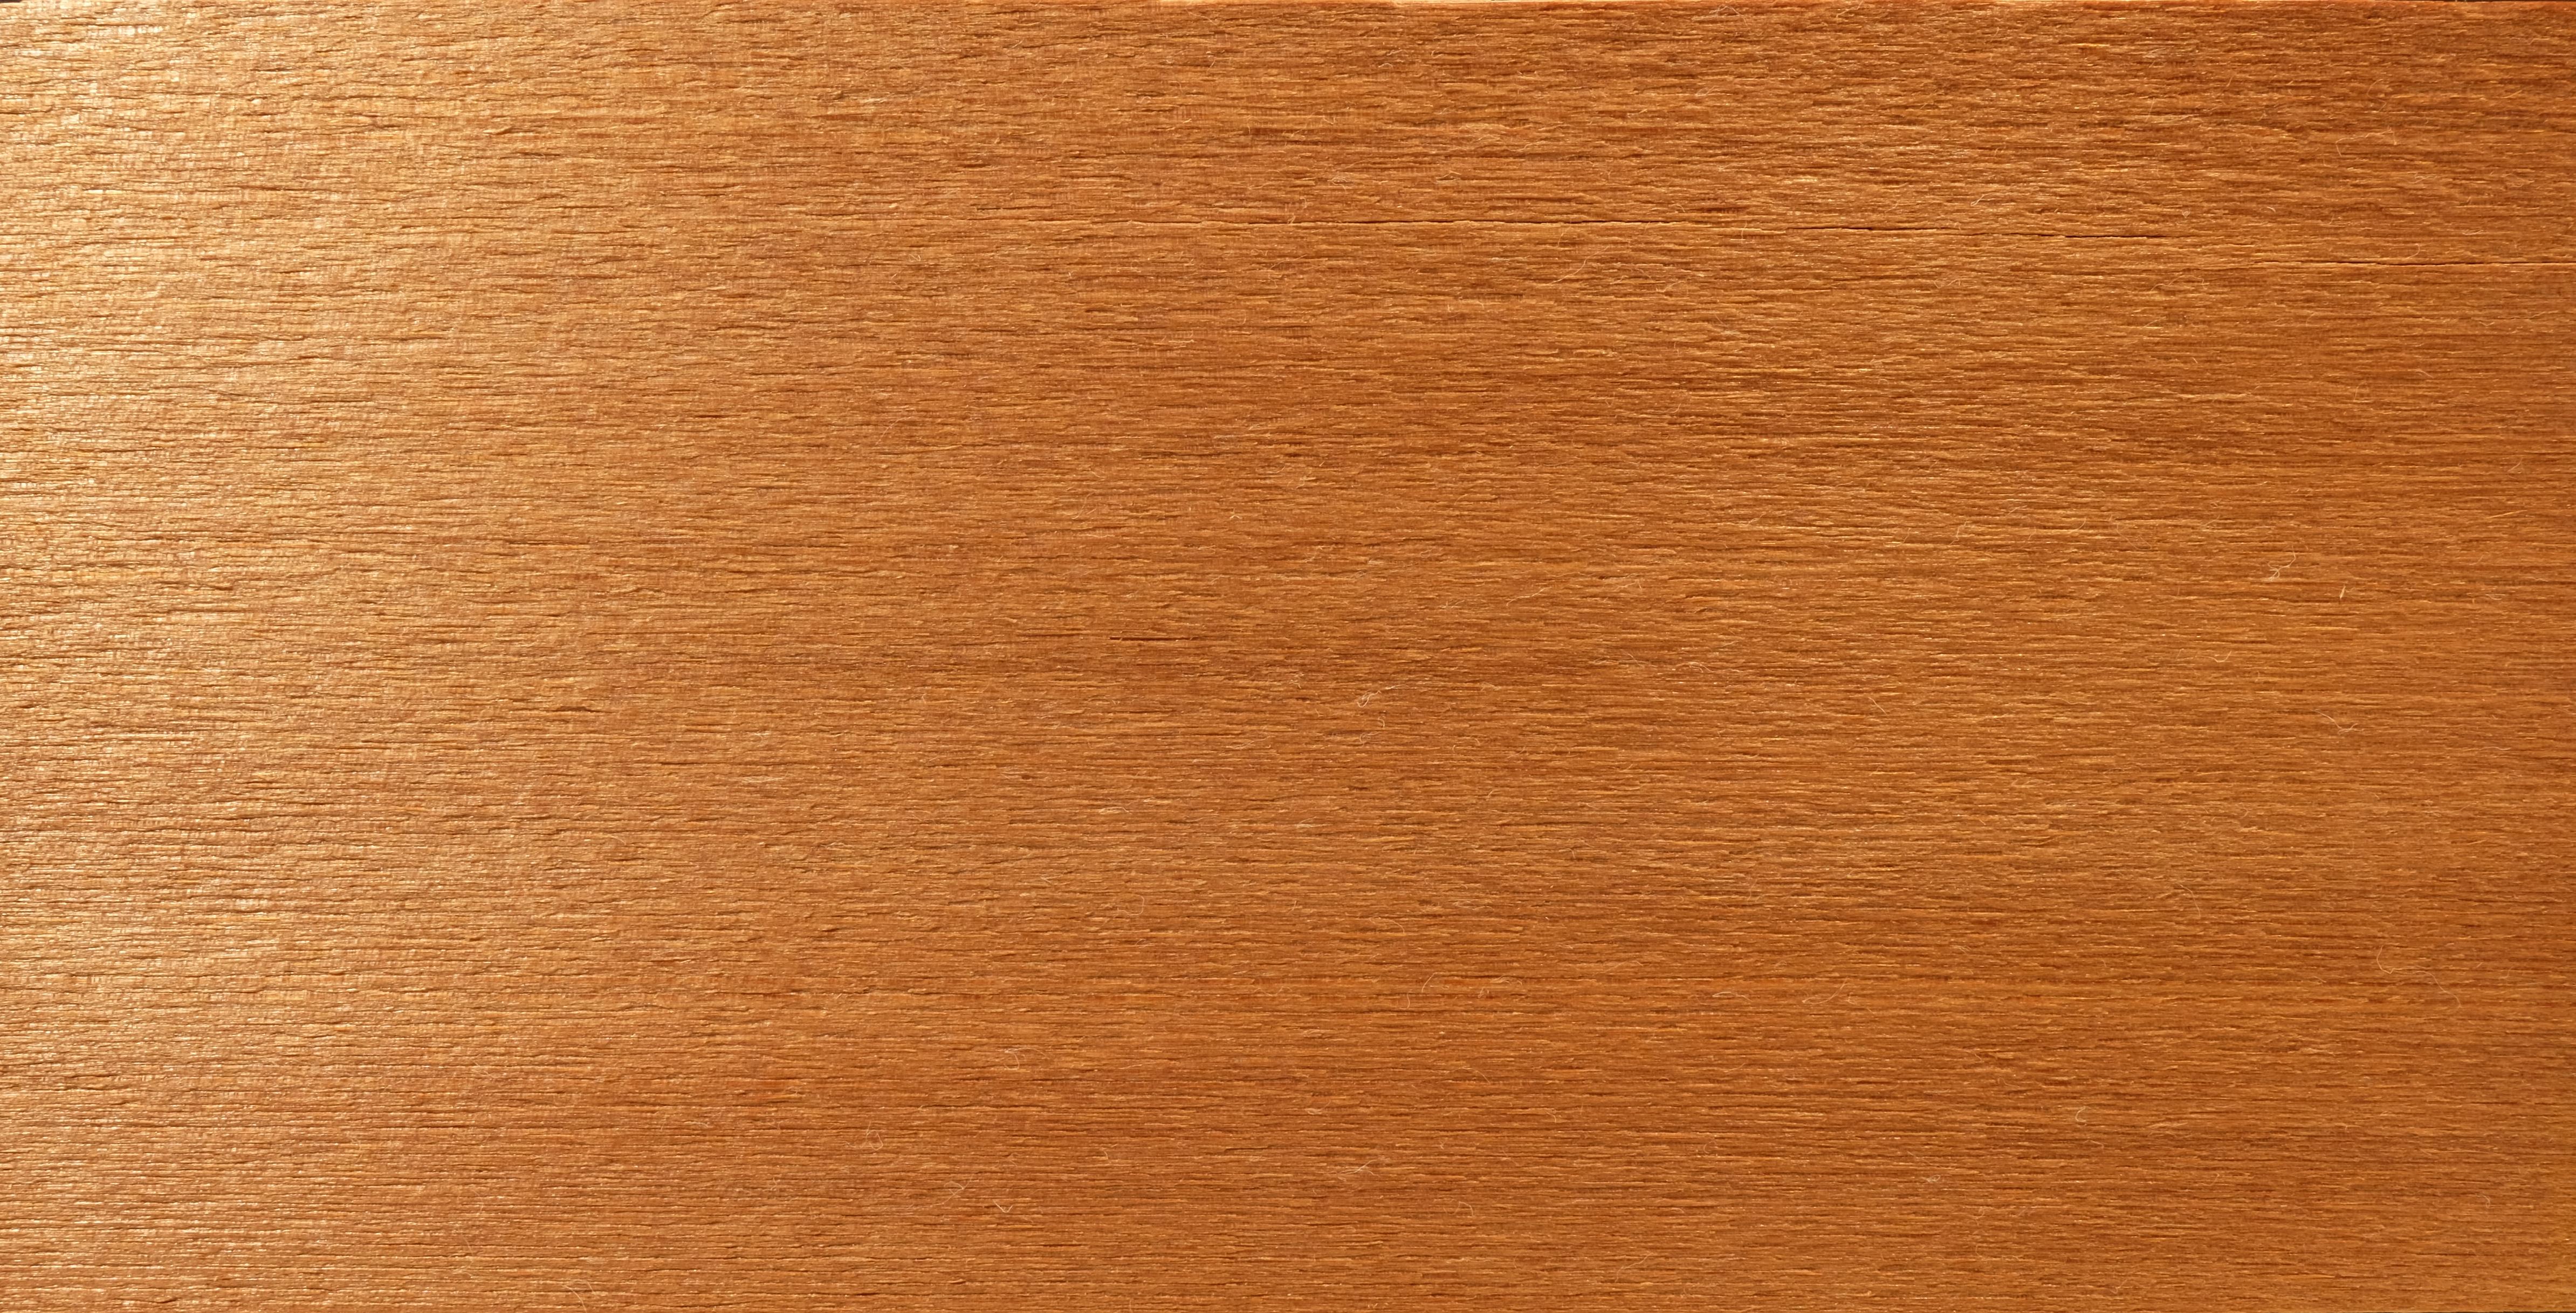 file californian redwood holz jpg wikimedia commons. Black Bedroom Furniture Sets. Home Design Ideas